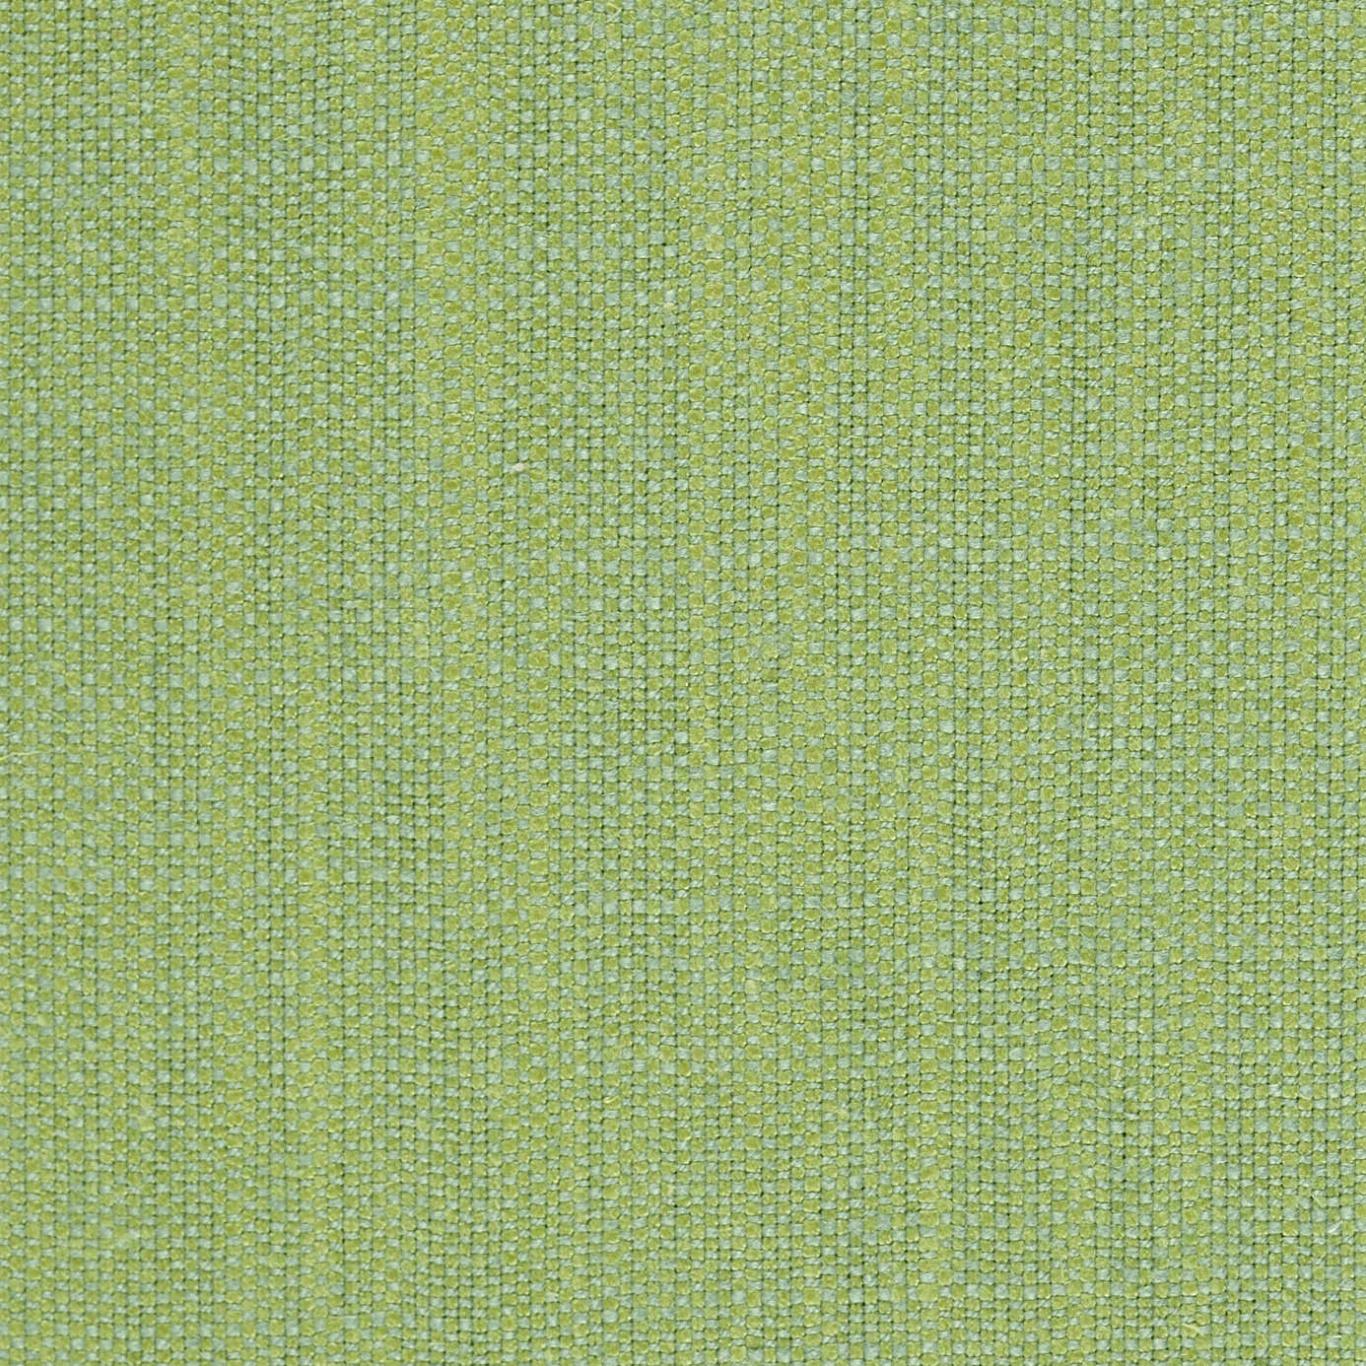 Image of Harlequin Atom Celadon Fabric 440044